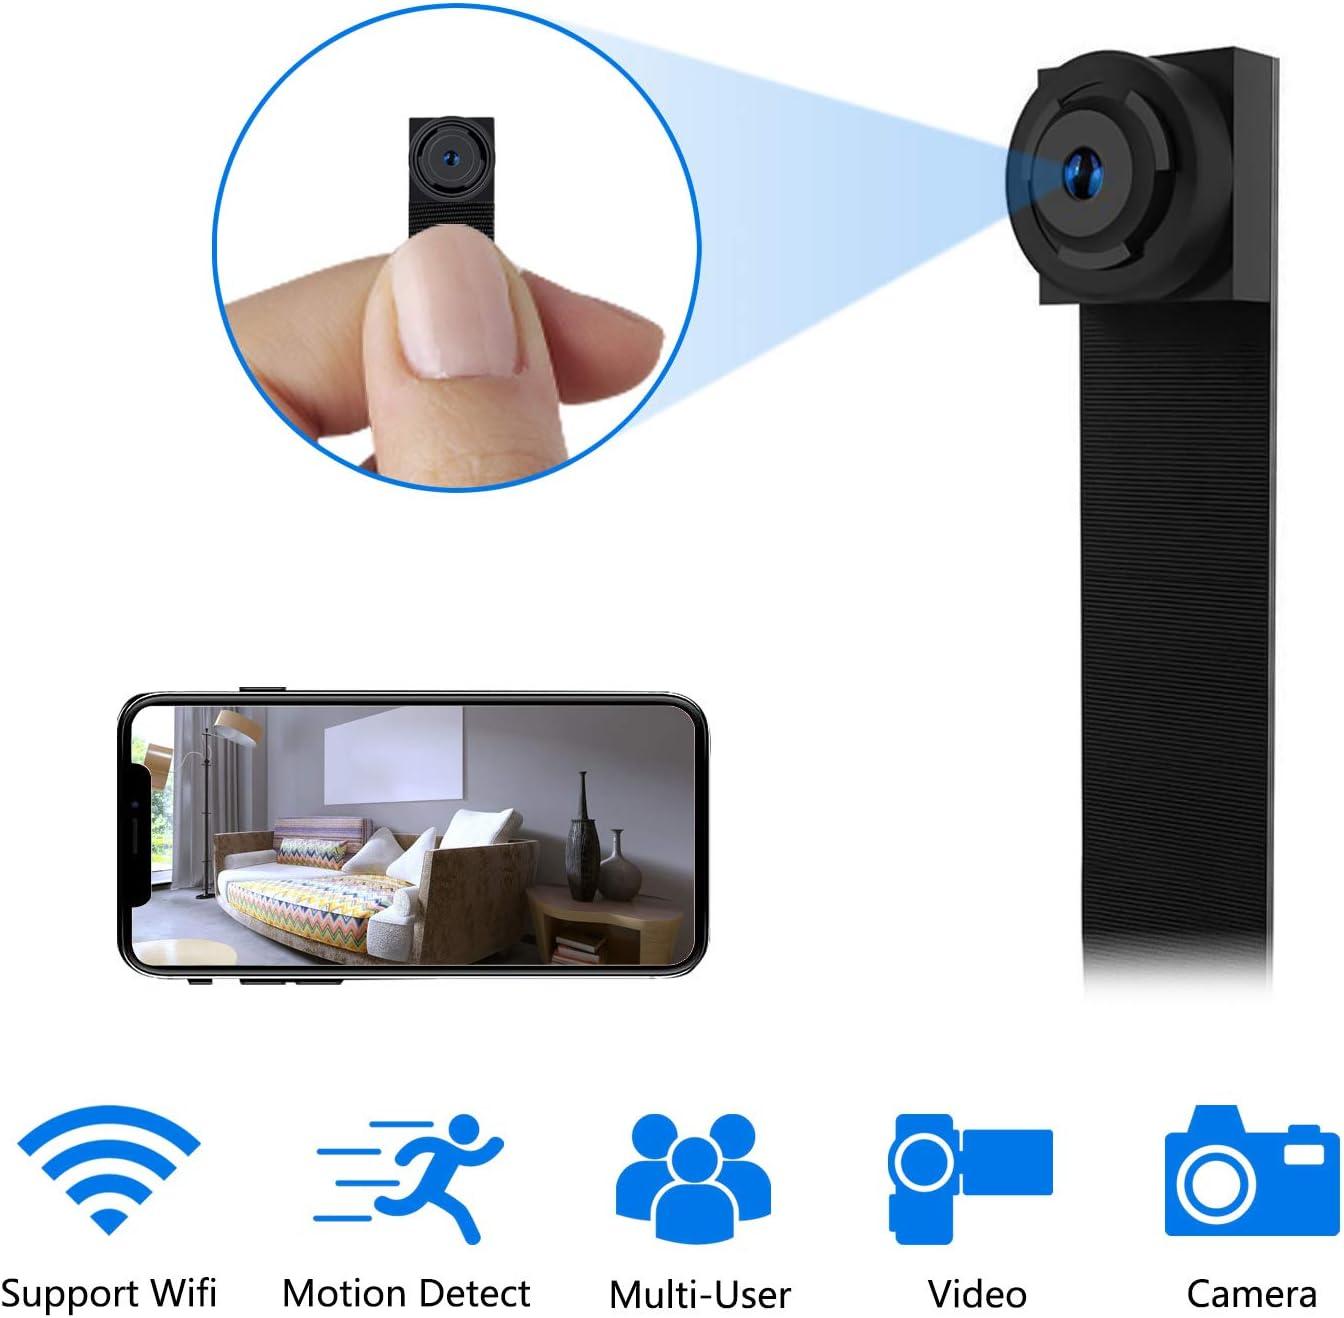 Mini Camara Espia WiFi,1080P DIY Cámara Oculta IP 2.4Ghz Vigilancia Portátil Secreta Compacta con Detector de Movimiento, WLAN Camaras de Seguridad Pequeña